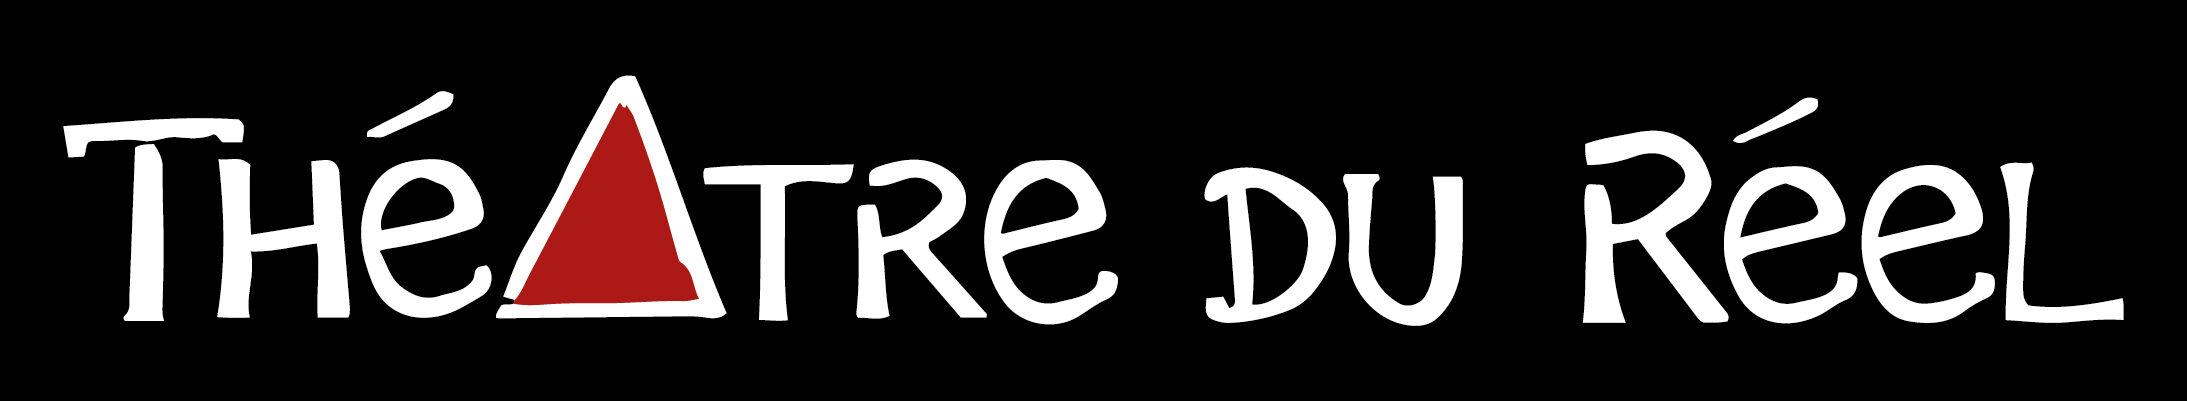 Logo-Theatre-du-Reel-coul-pour-fond-noir-RVB-01-3.jpg